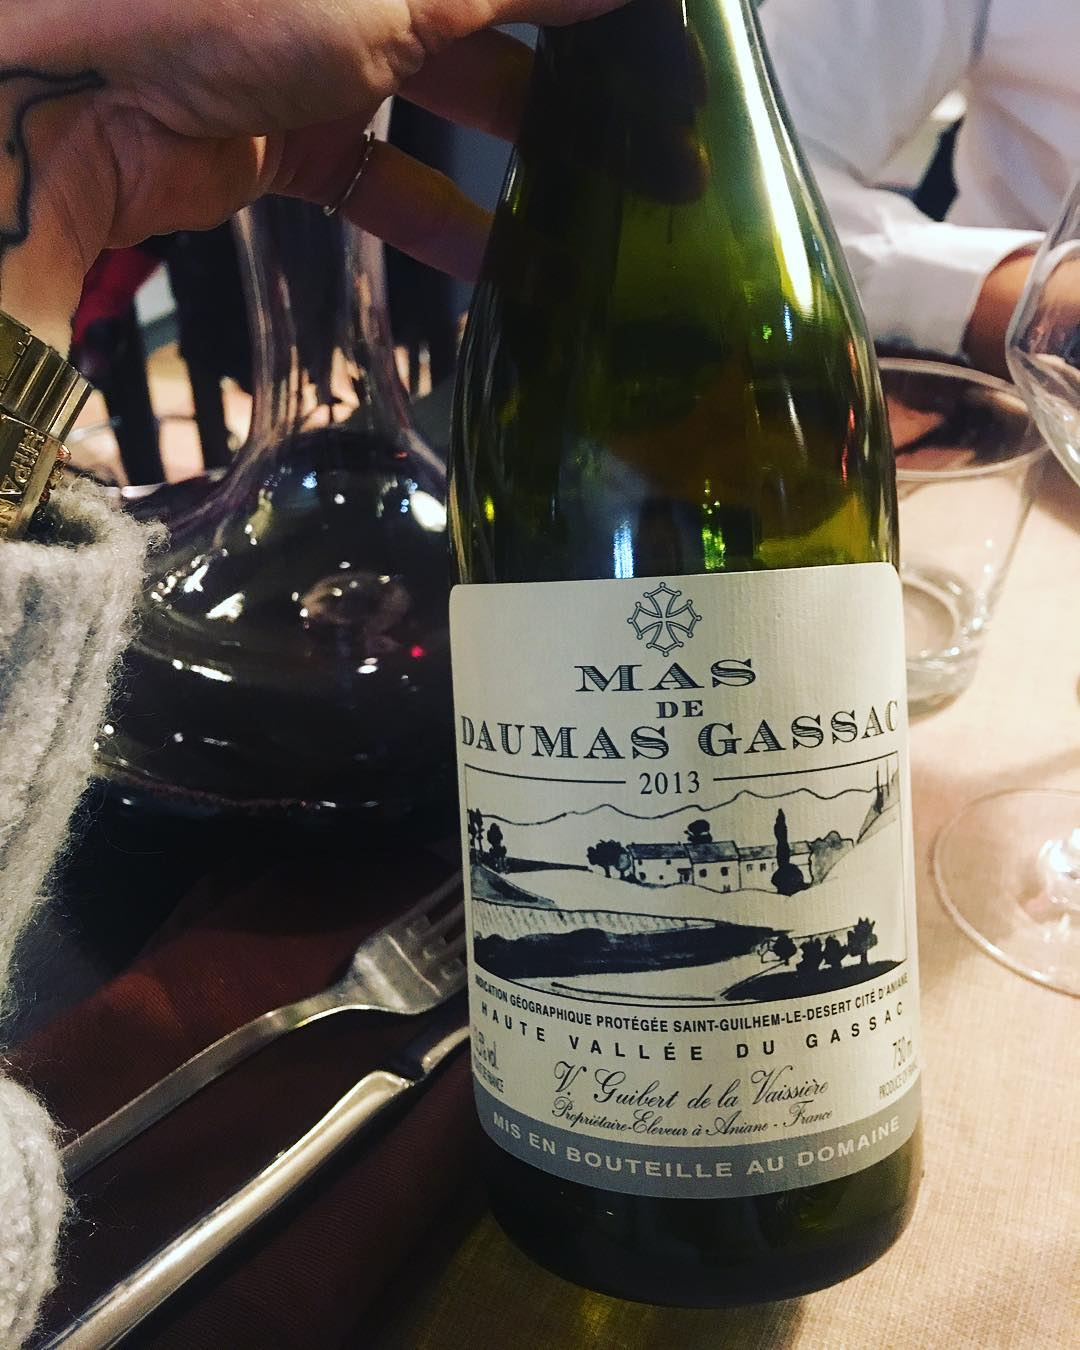 Petits plaisirs ❤️ Mas de Daumas Gassac . ➕ Le Tonneau Rouge • restaurant . ? ANIANE (34)?? . ________________ #restaurant #tonneaurouge #aniane #fooding #food #blogfood #foodlover #foodblogger #montpellier #pintademontpellier